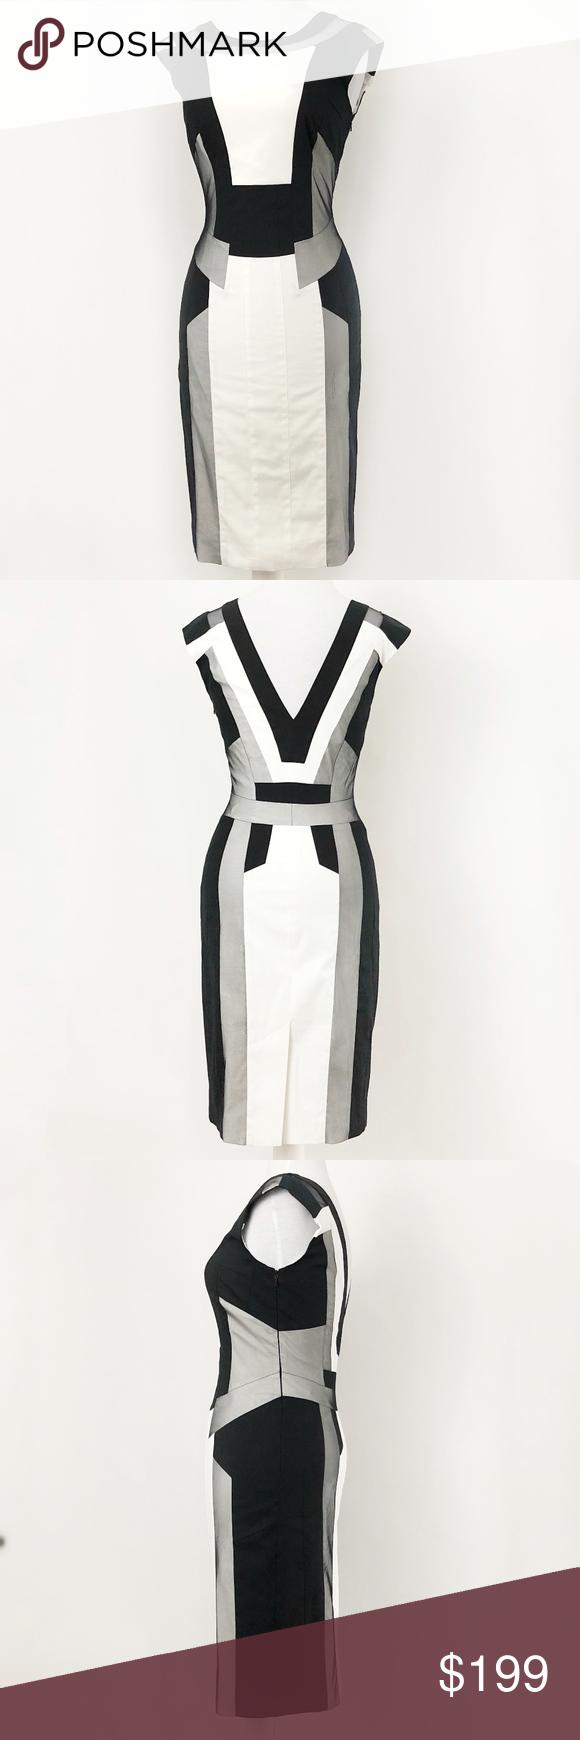 ec109c56c8 karen millen • graphic mesh panel pencil dress 4•6 Boutique